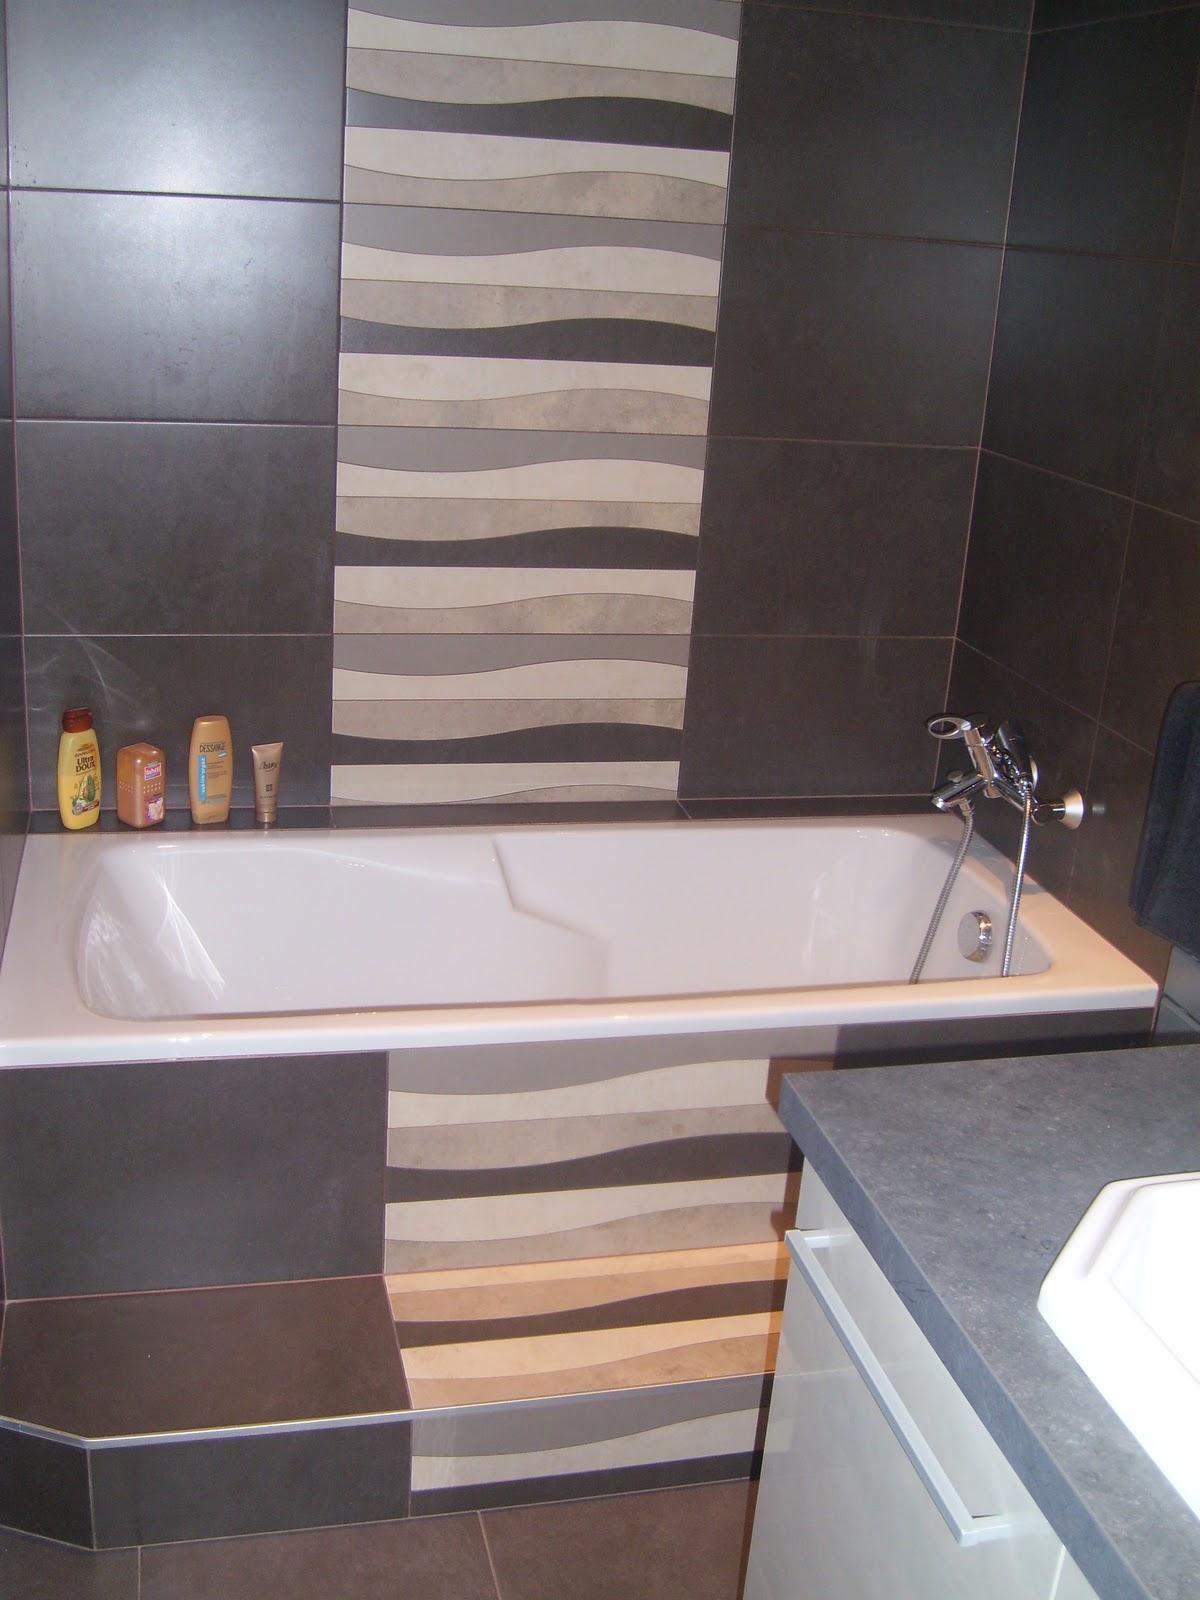 Salle de bain taupe et beige for Salle de bain beige